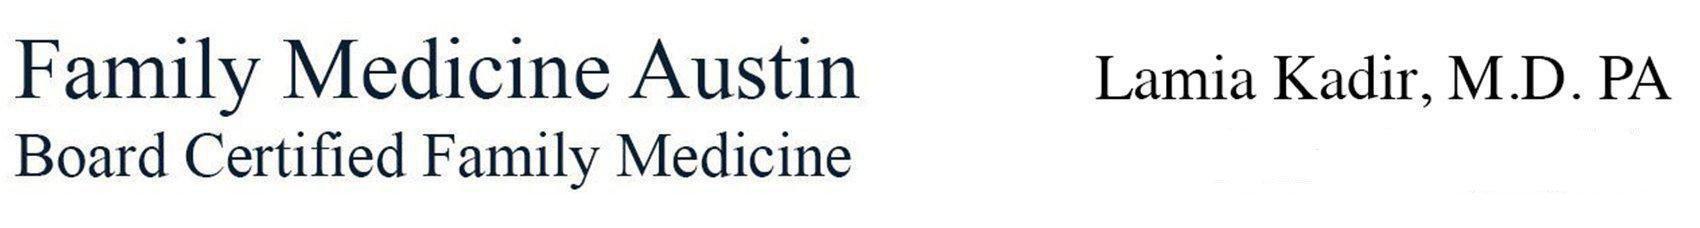 Family Medicine Austin Logo